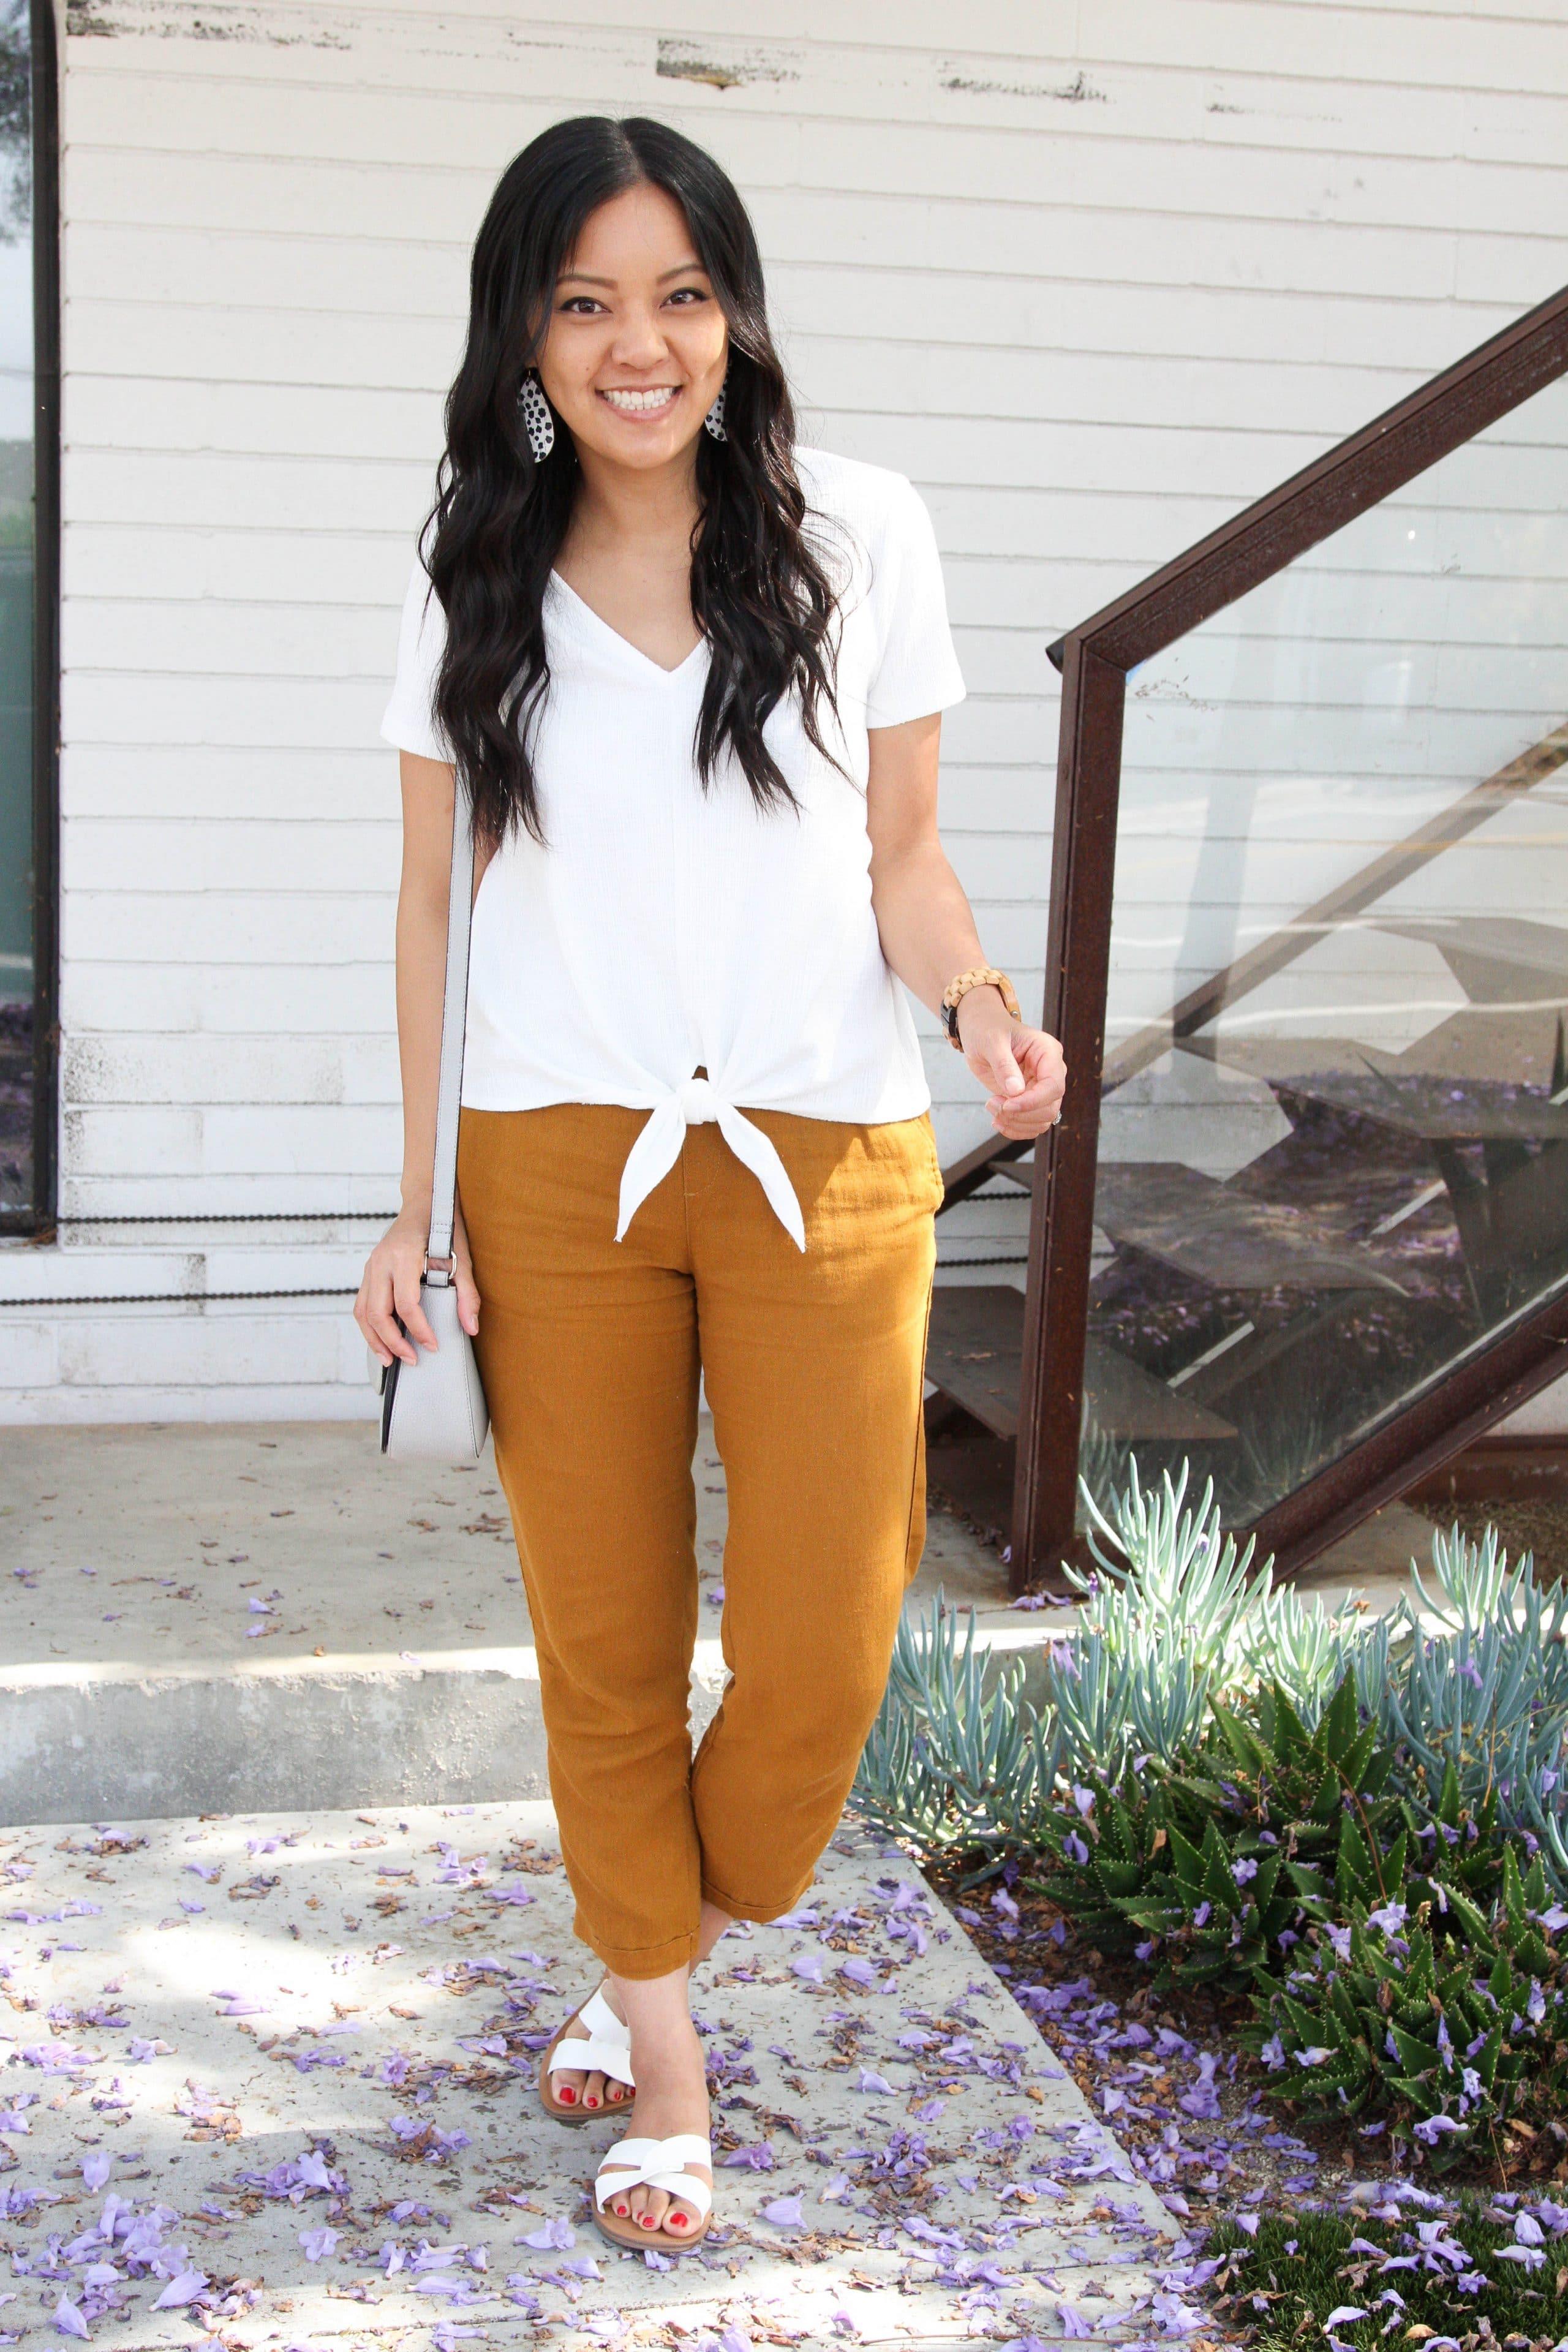 white tie top + tan linen pants + white sandals